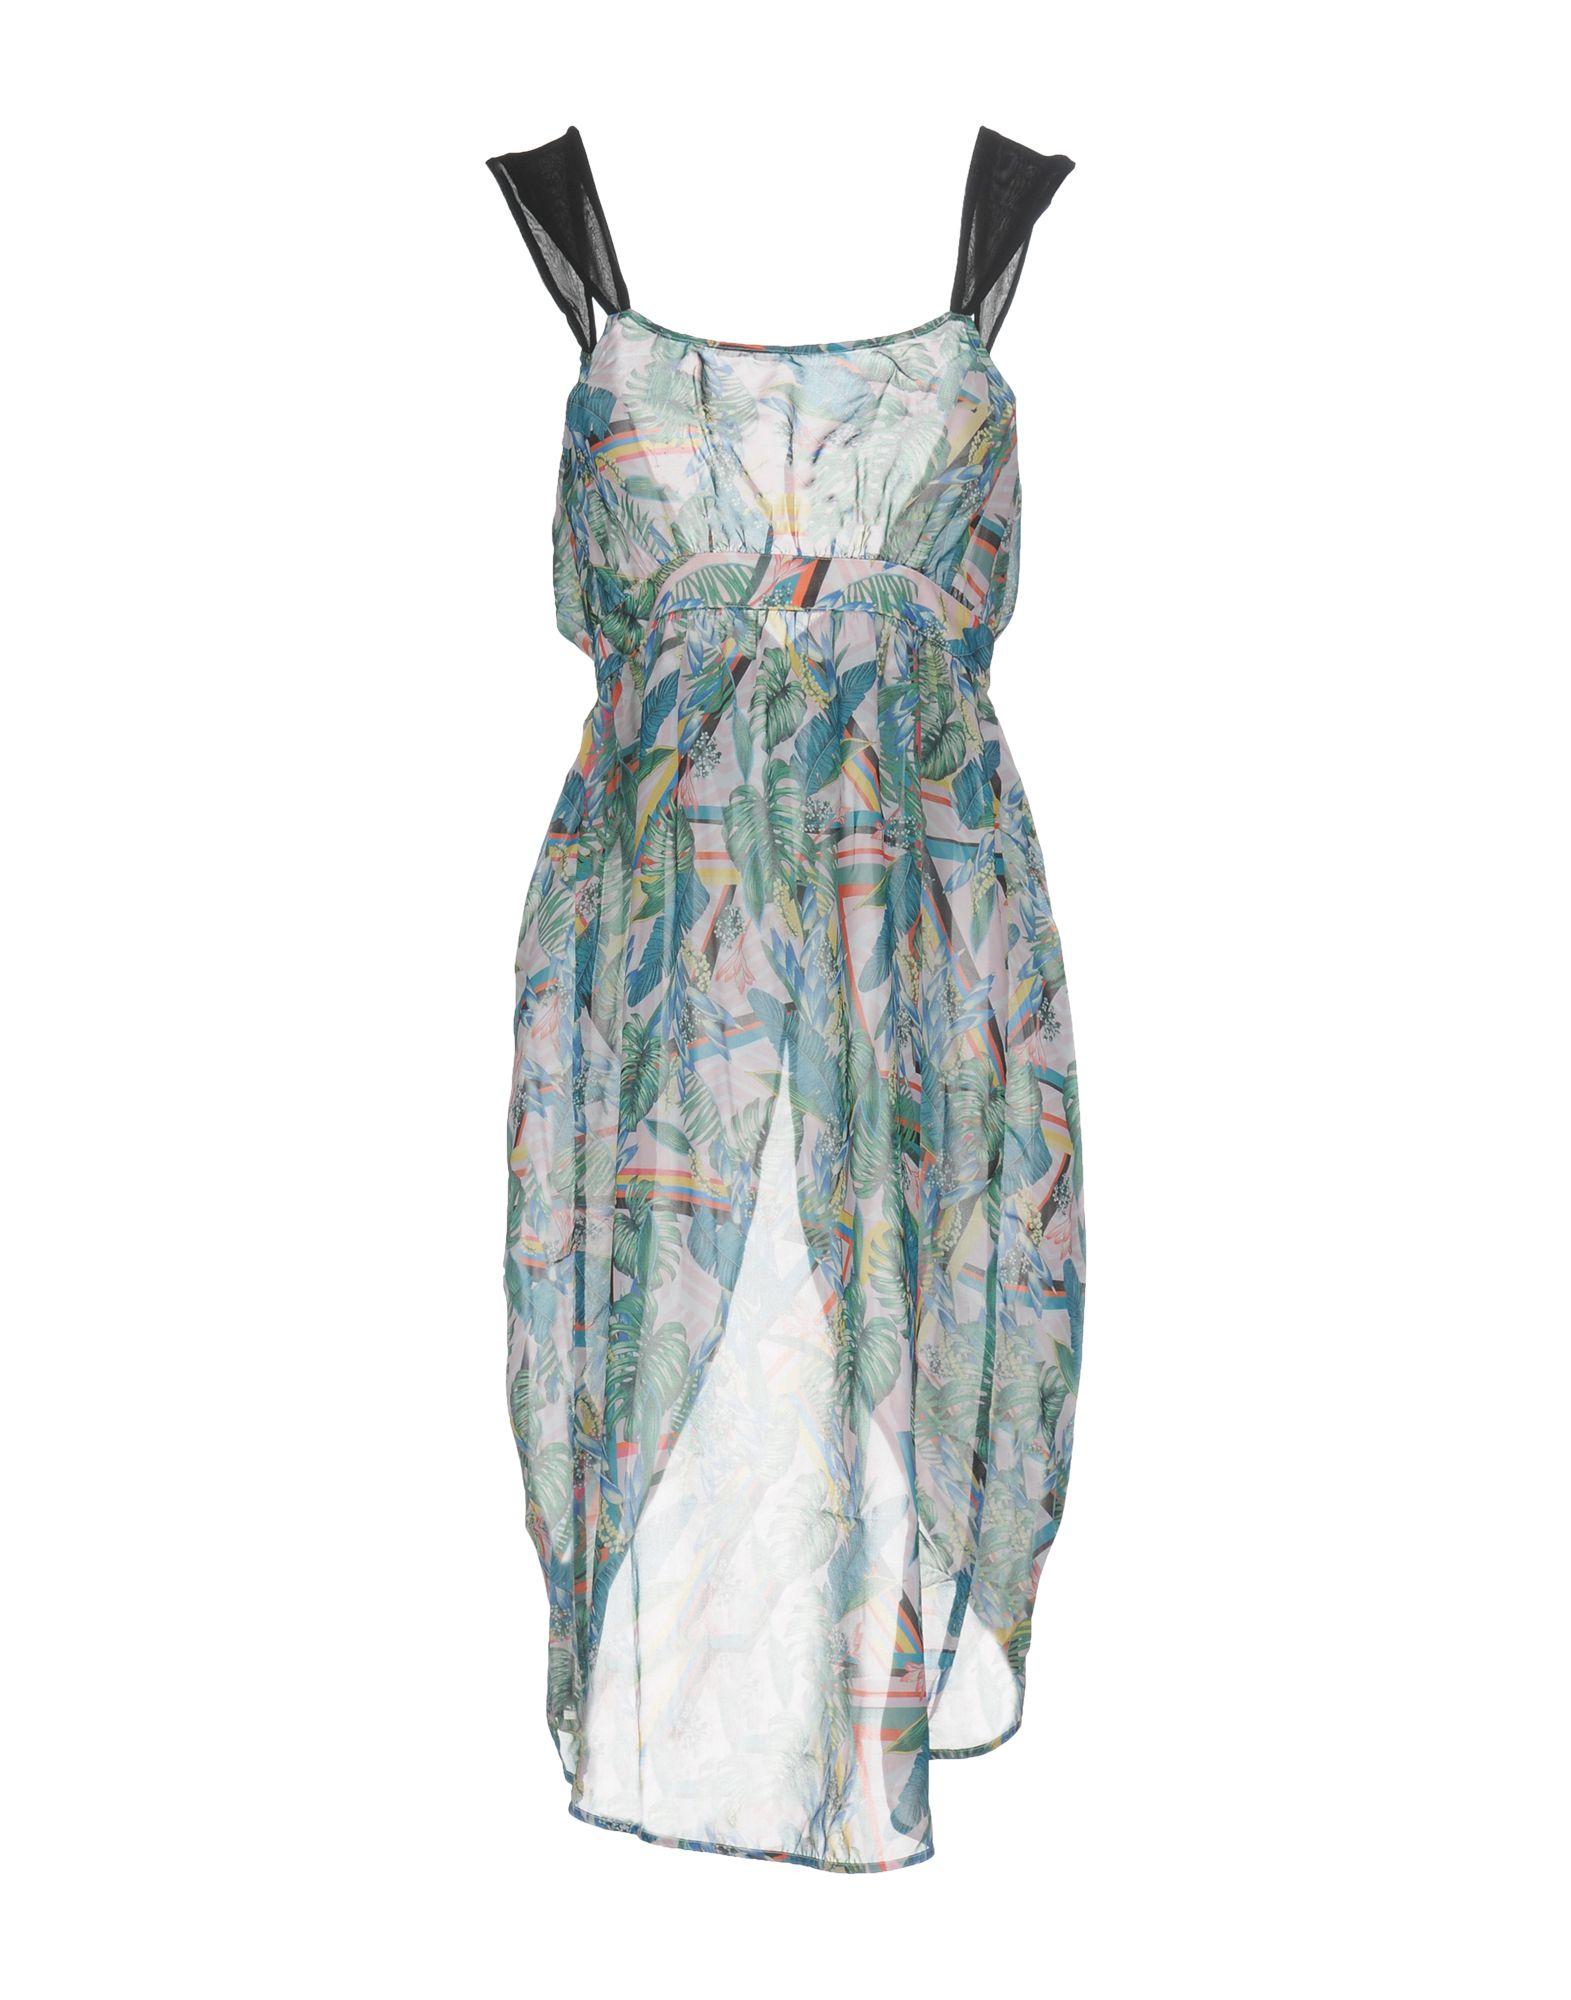 59734c6aa103 GUESS - Γυναικεία Κοντά Φορέματα - Φθηνότερα Προϊόντα - Σελίδα 6 ...